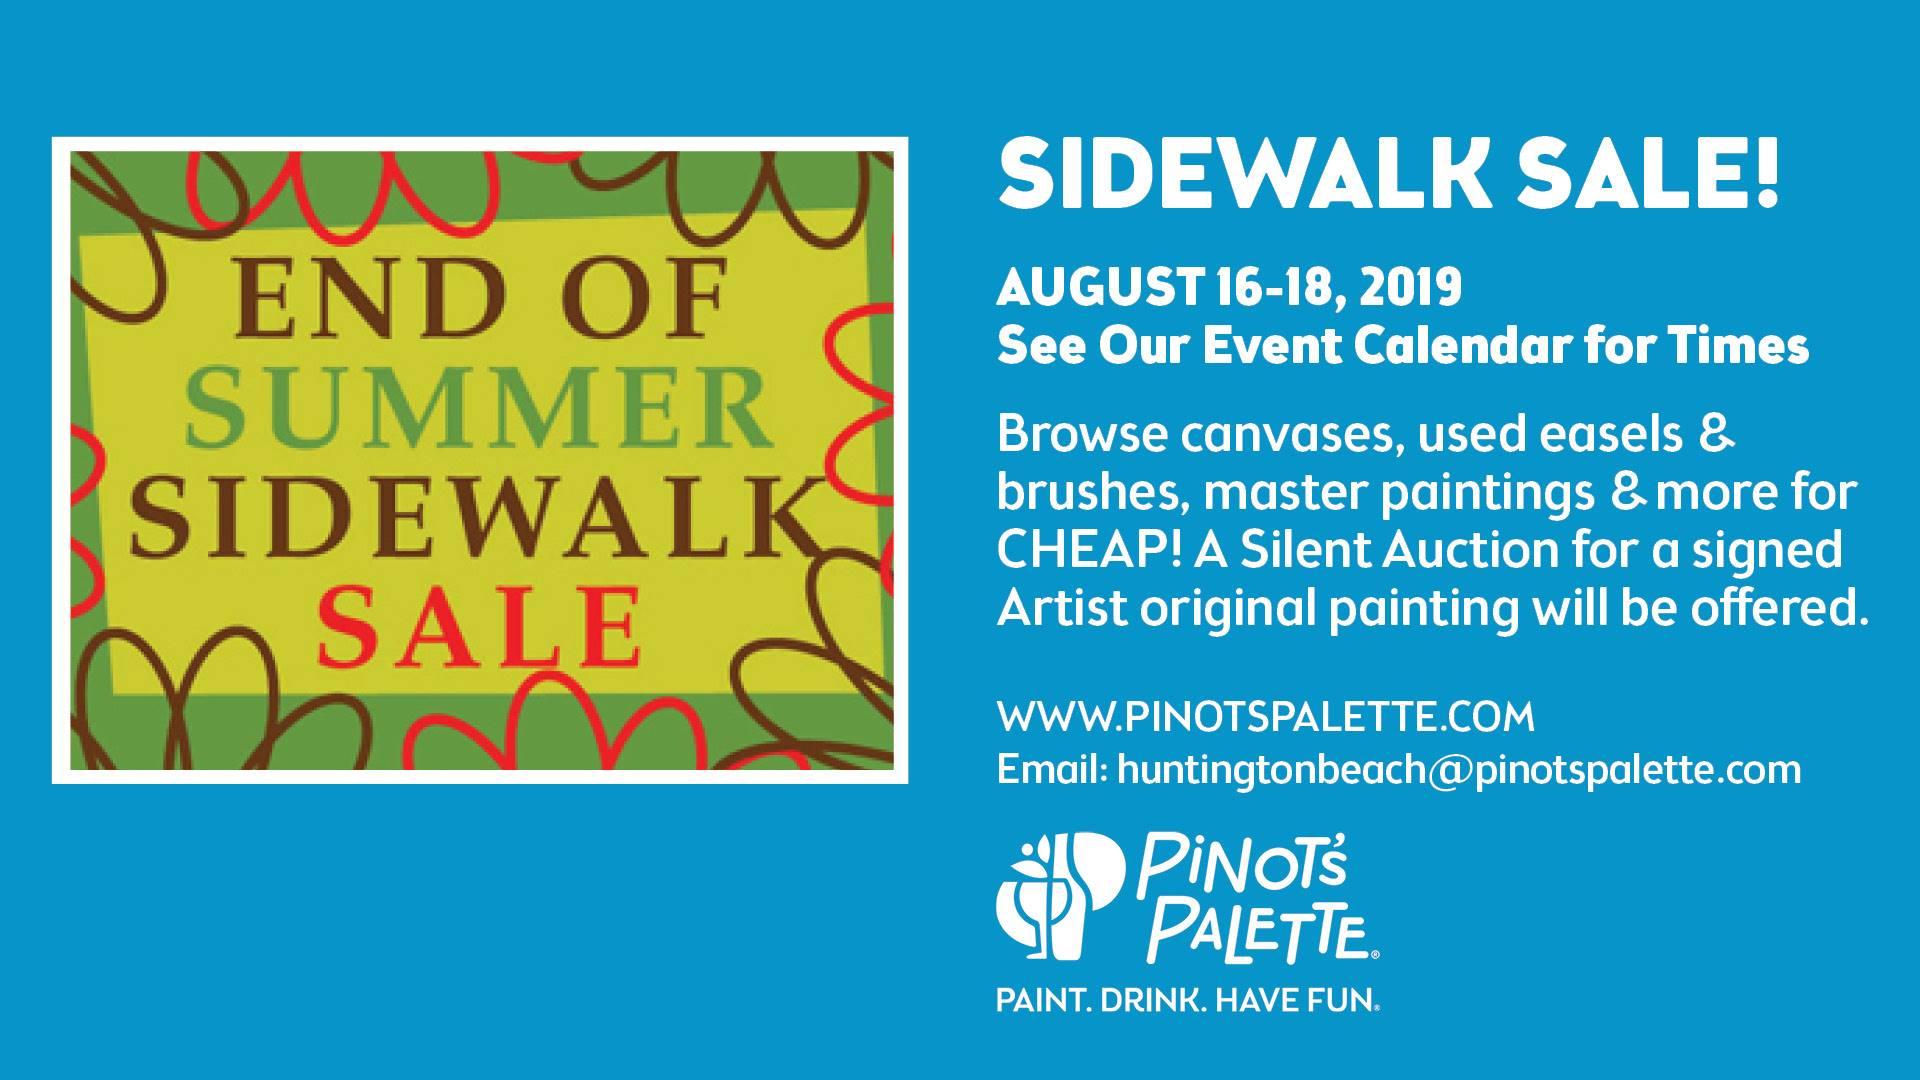 Pinot's Palette Sidewalk Sale.jpg